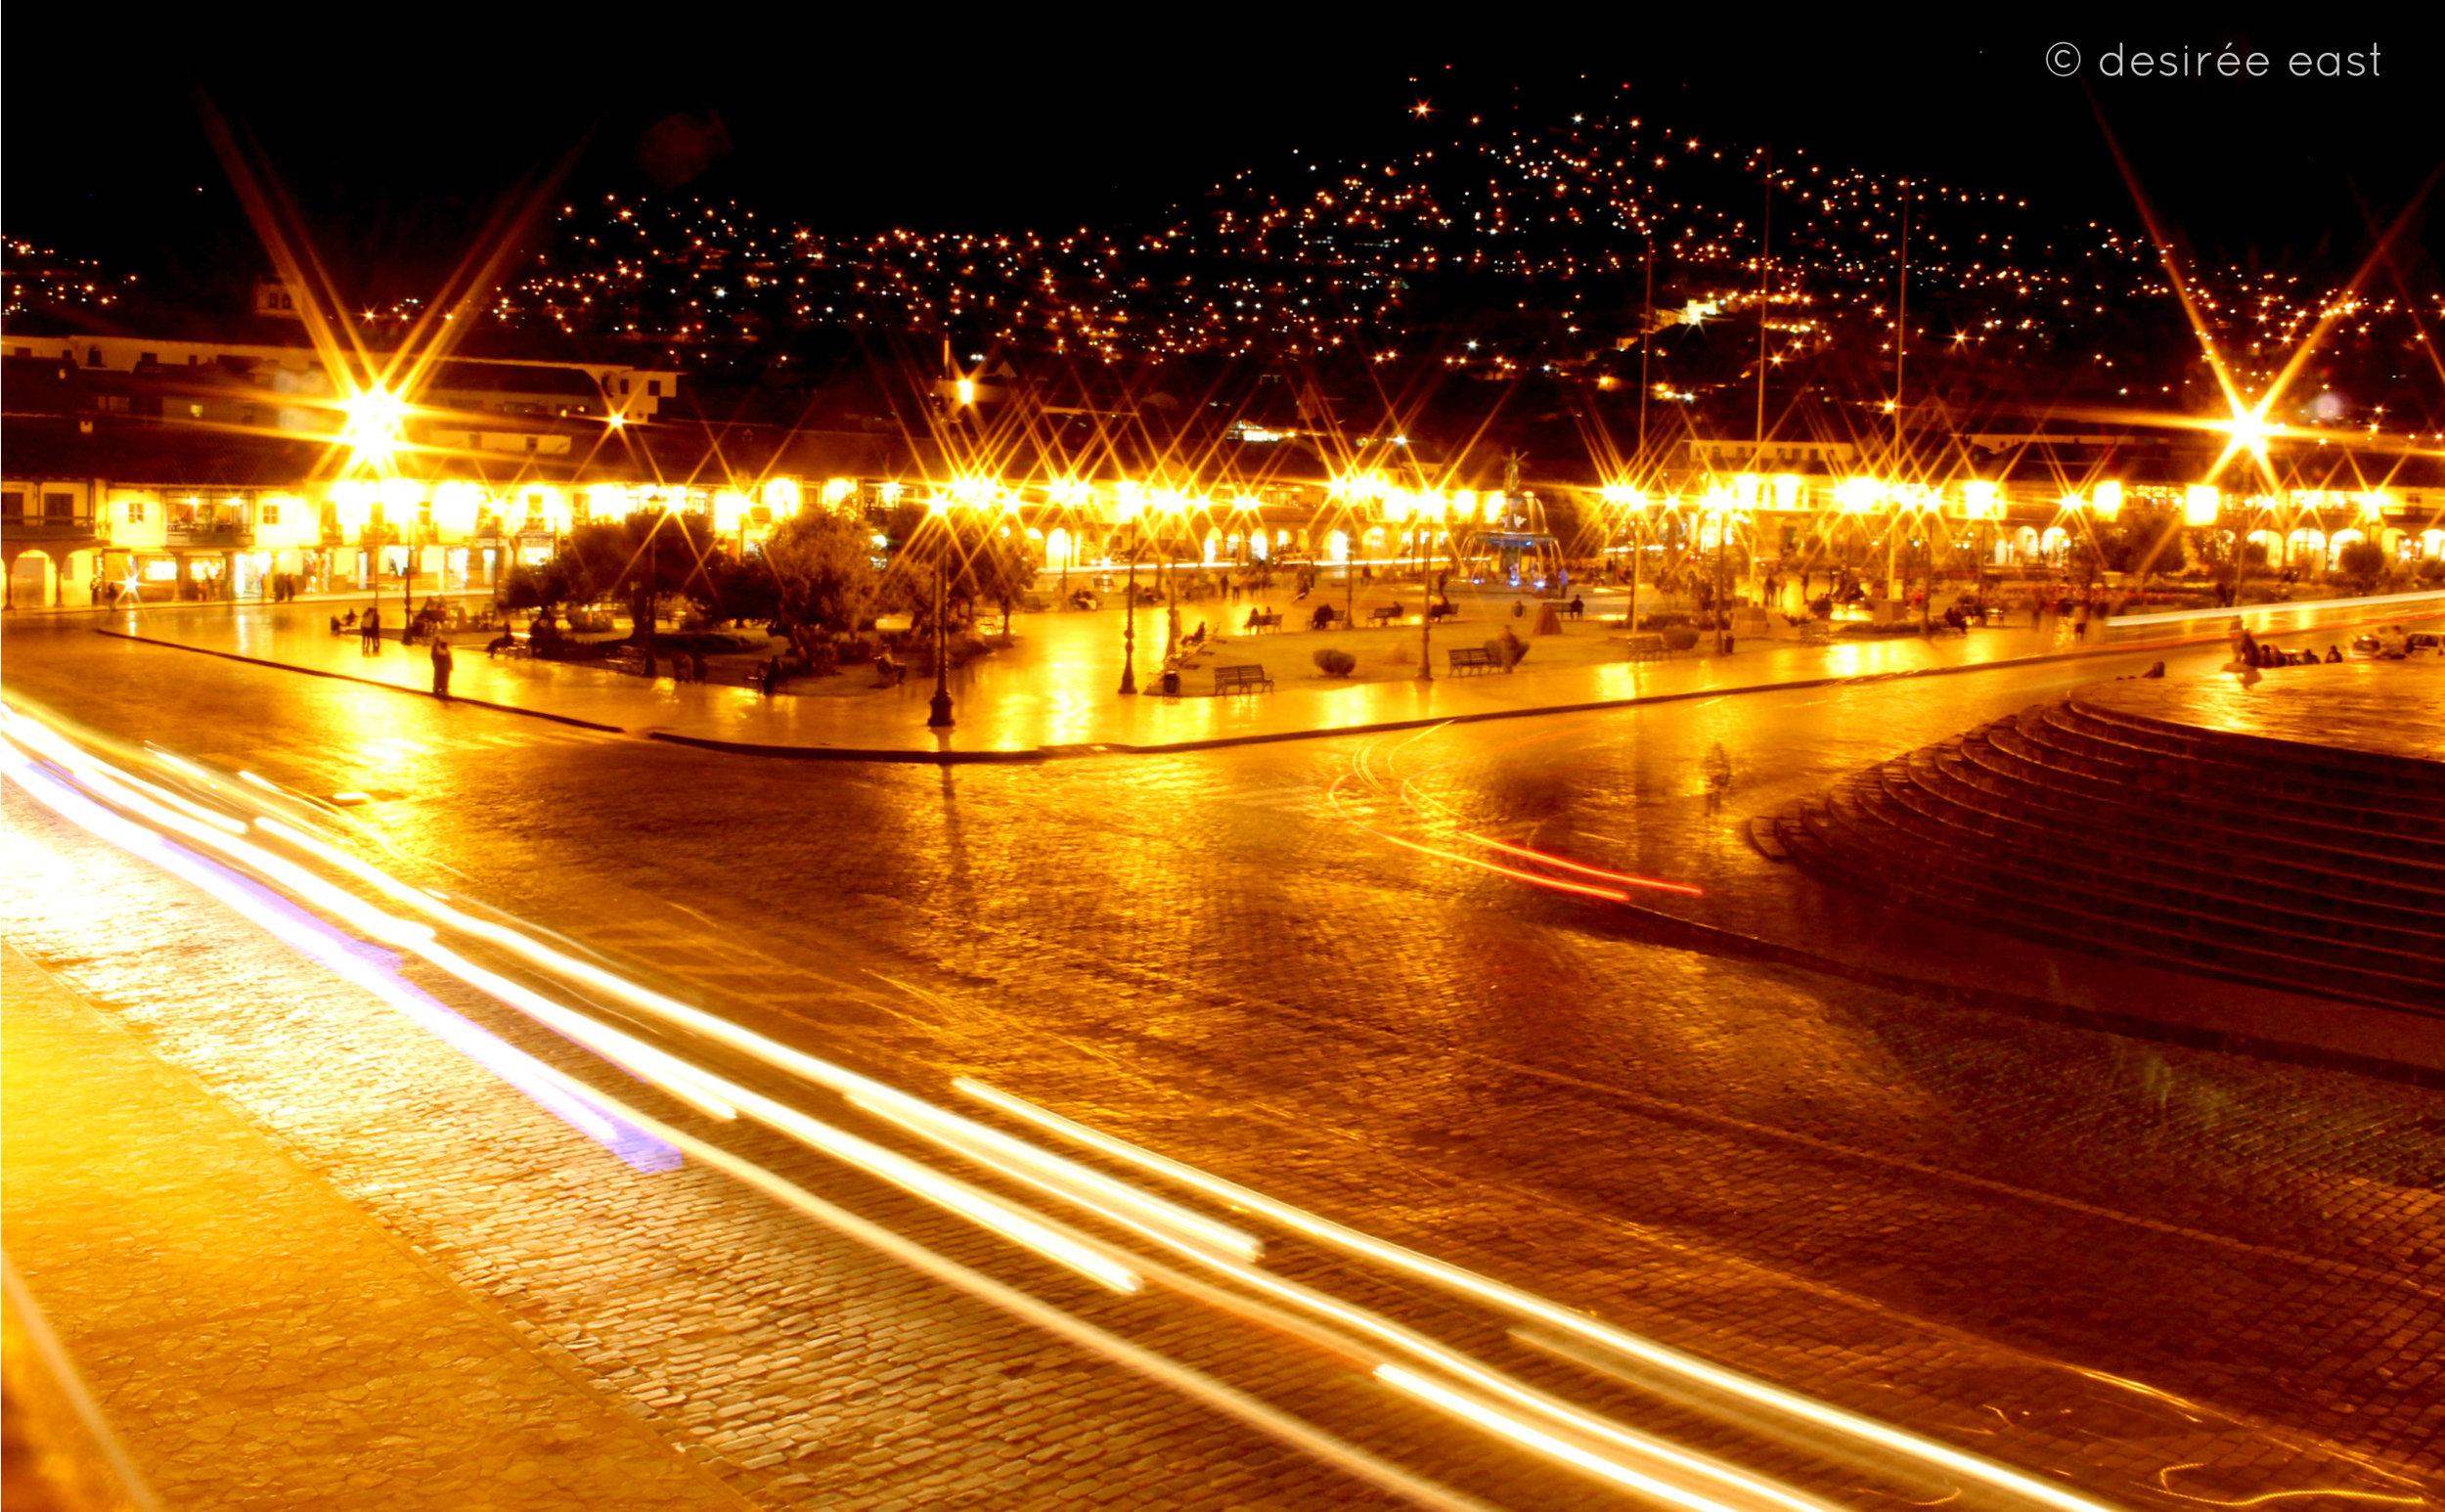 cuzco-peru-photography-by-desiree-east-2.jpg